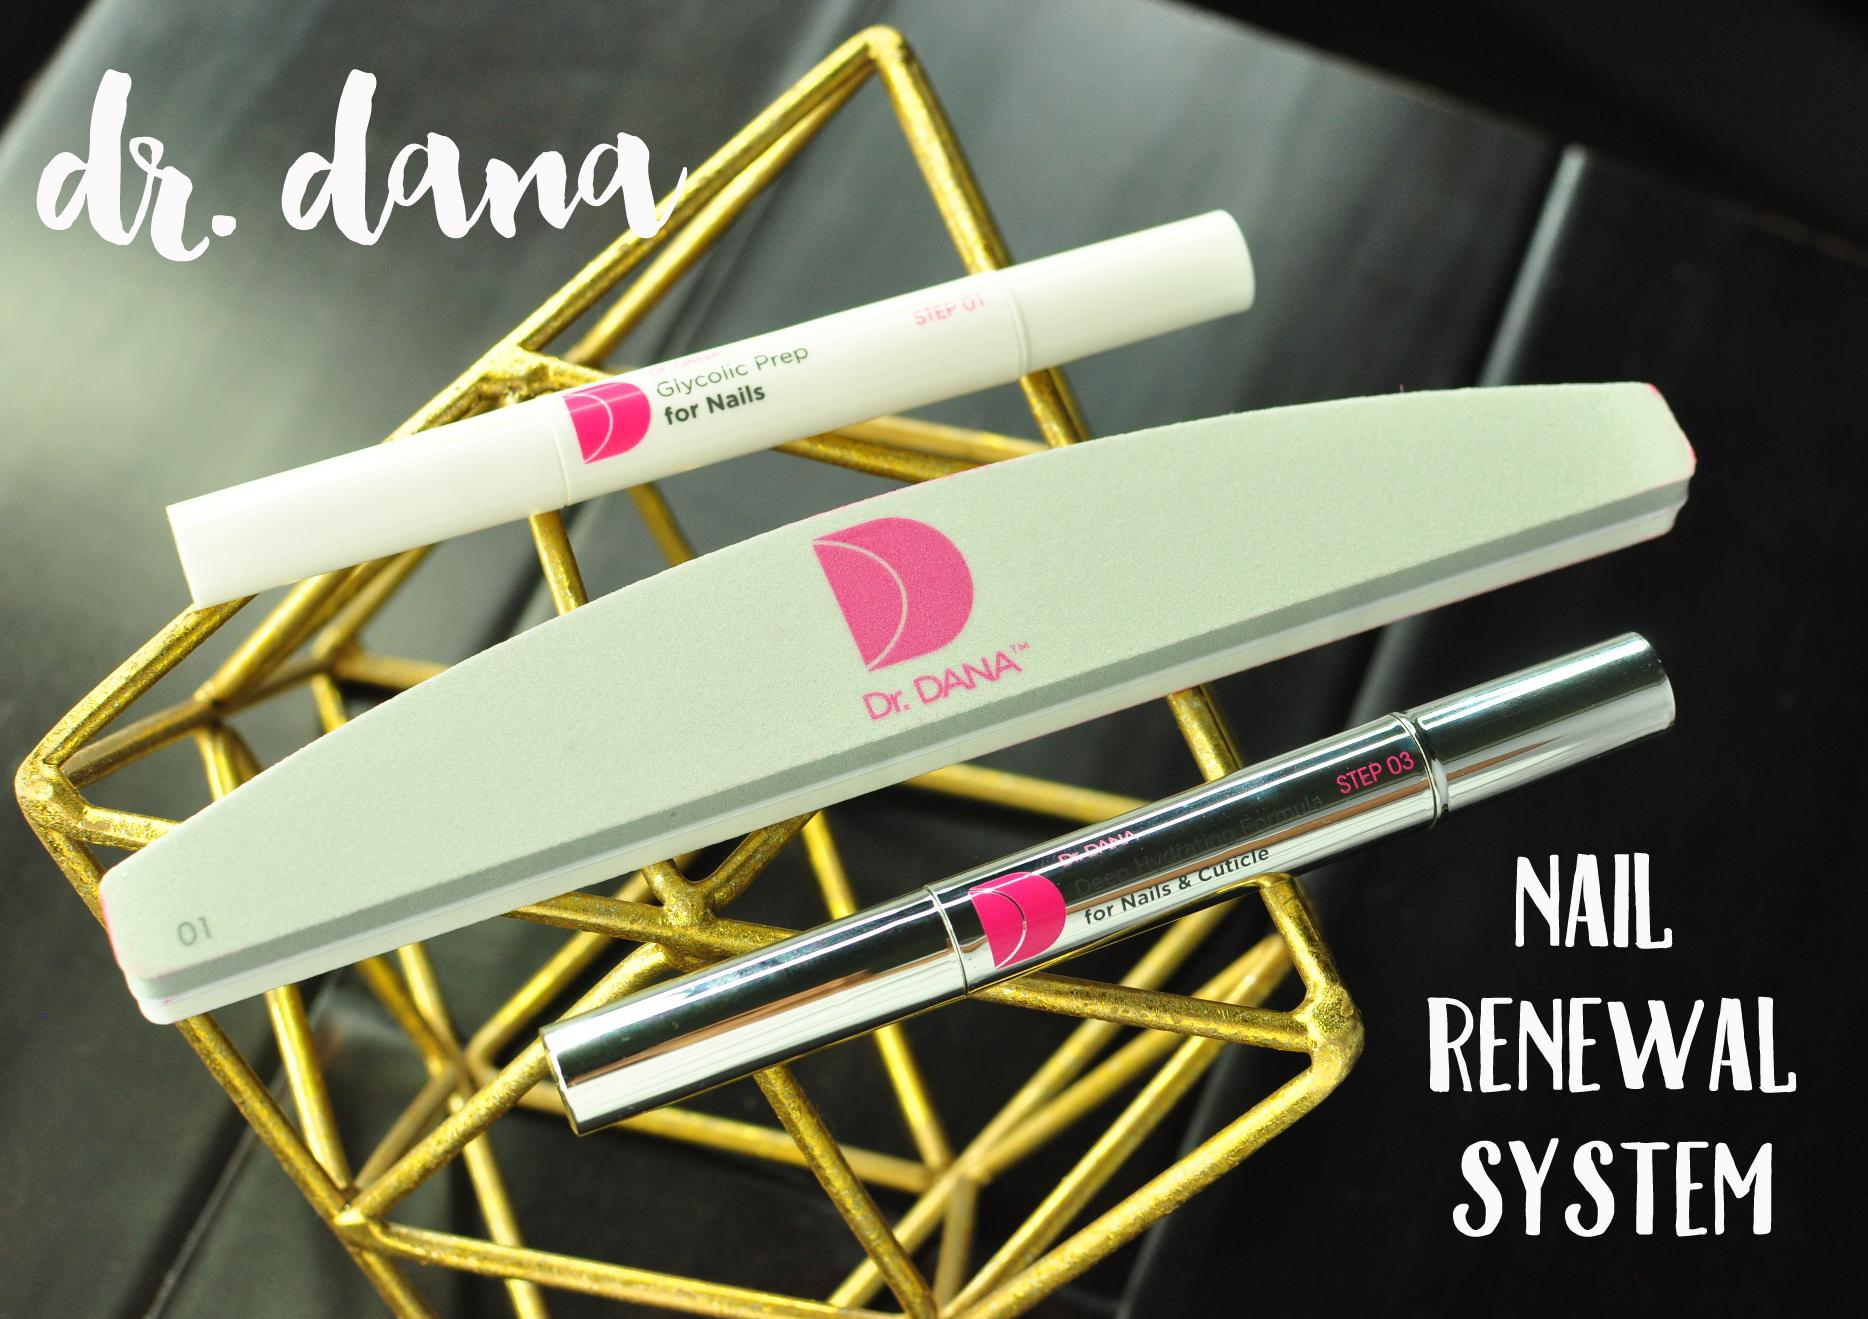 Dr Dana Nail Renewal System Review Dana, Nuskin, Nail kit